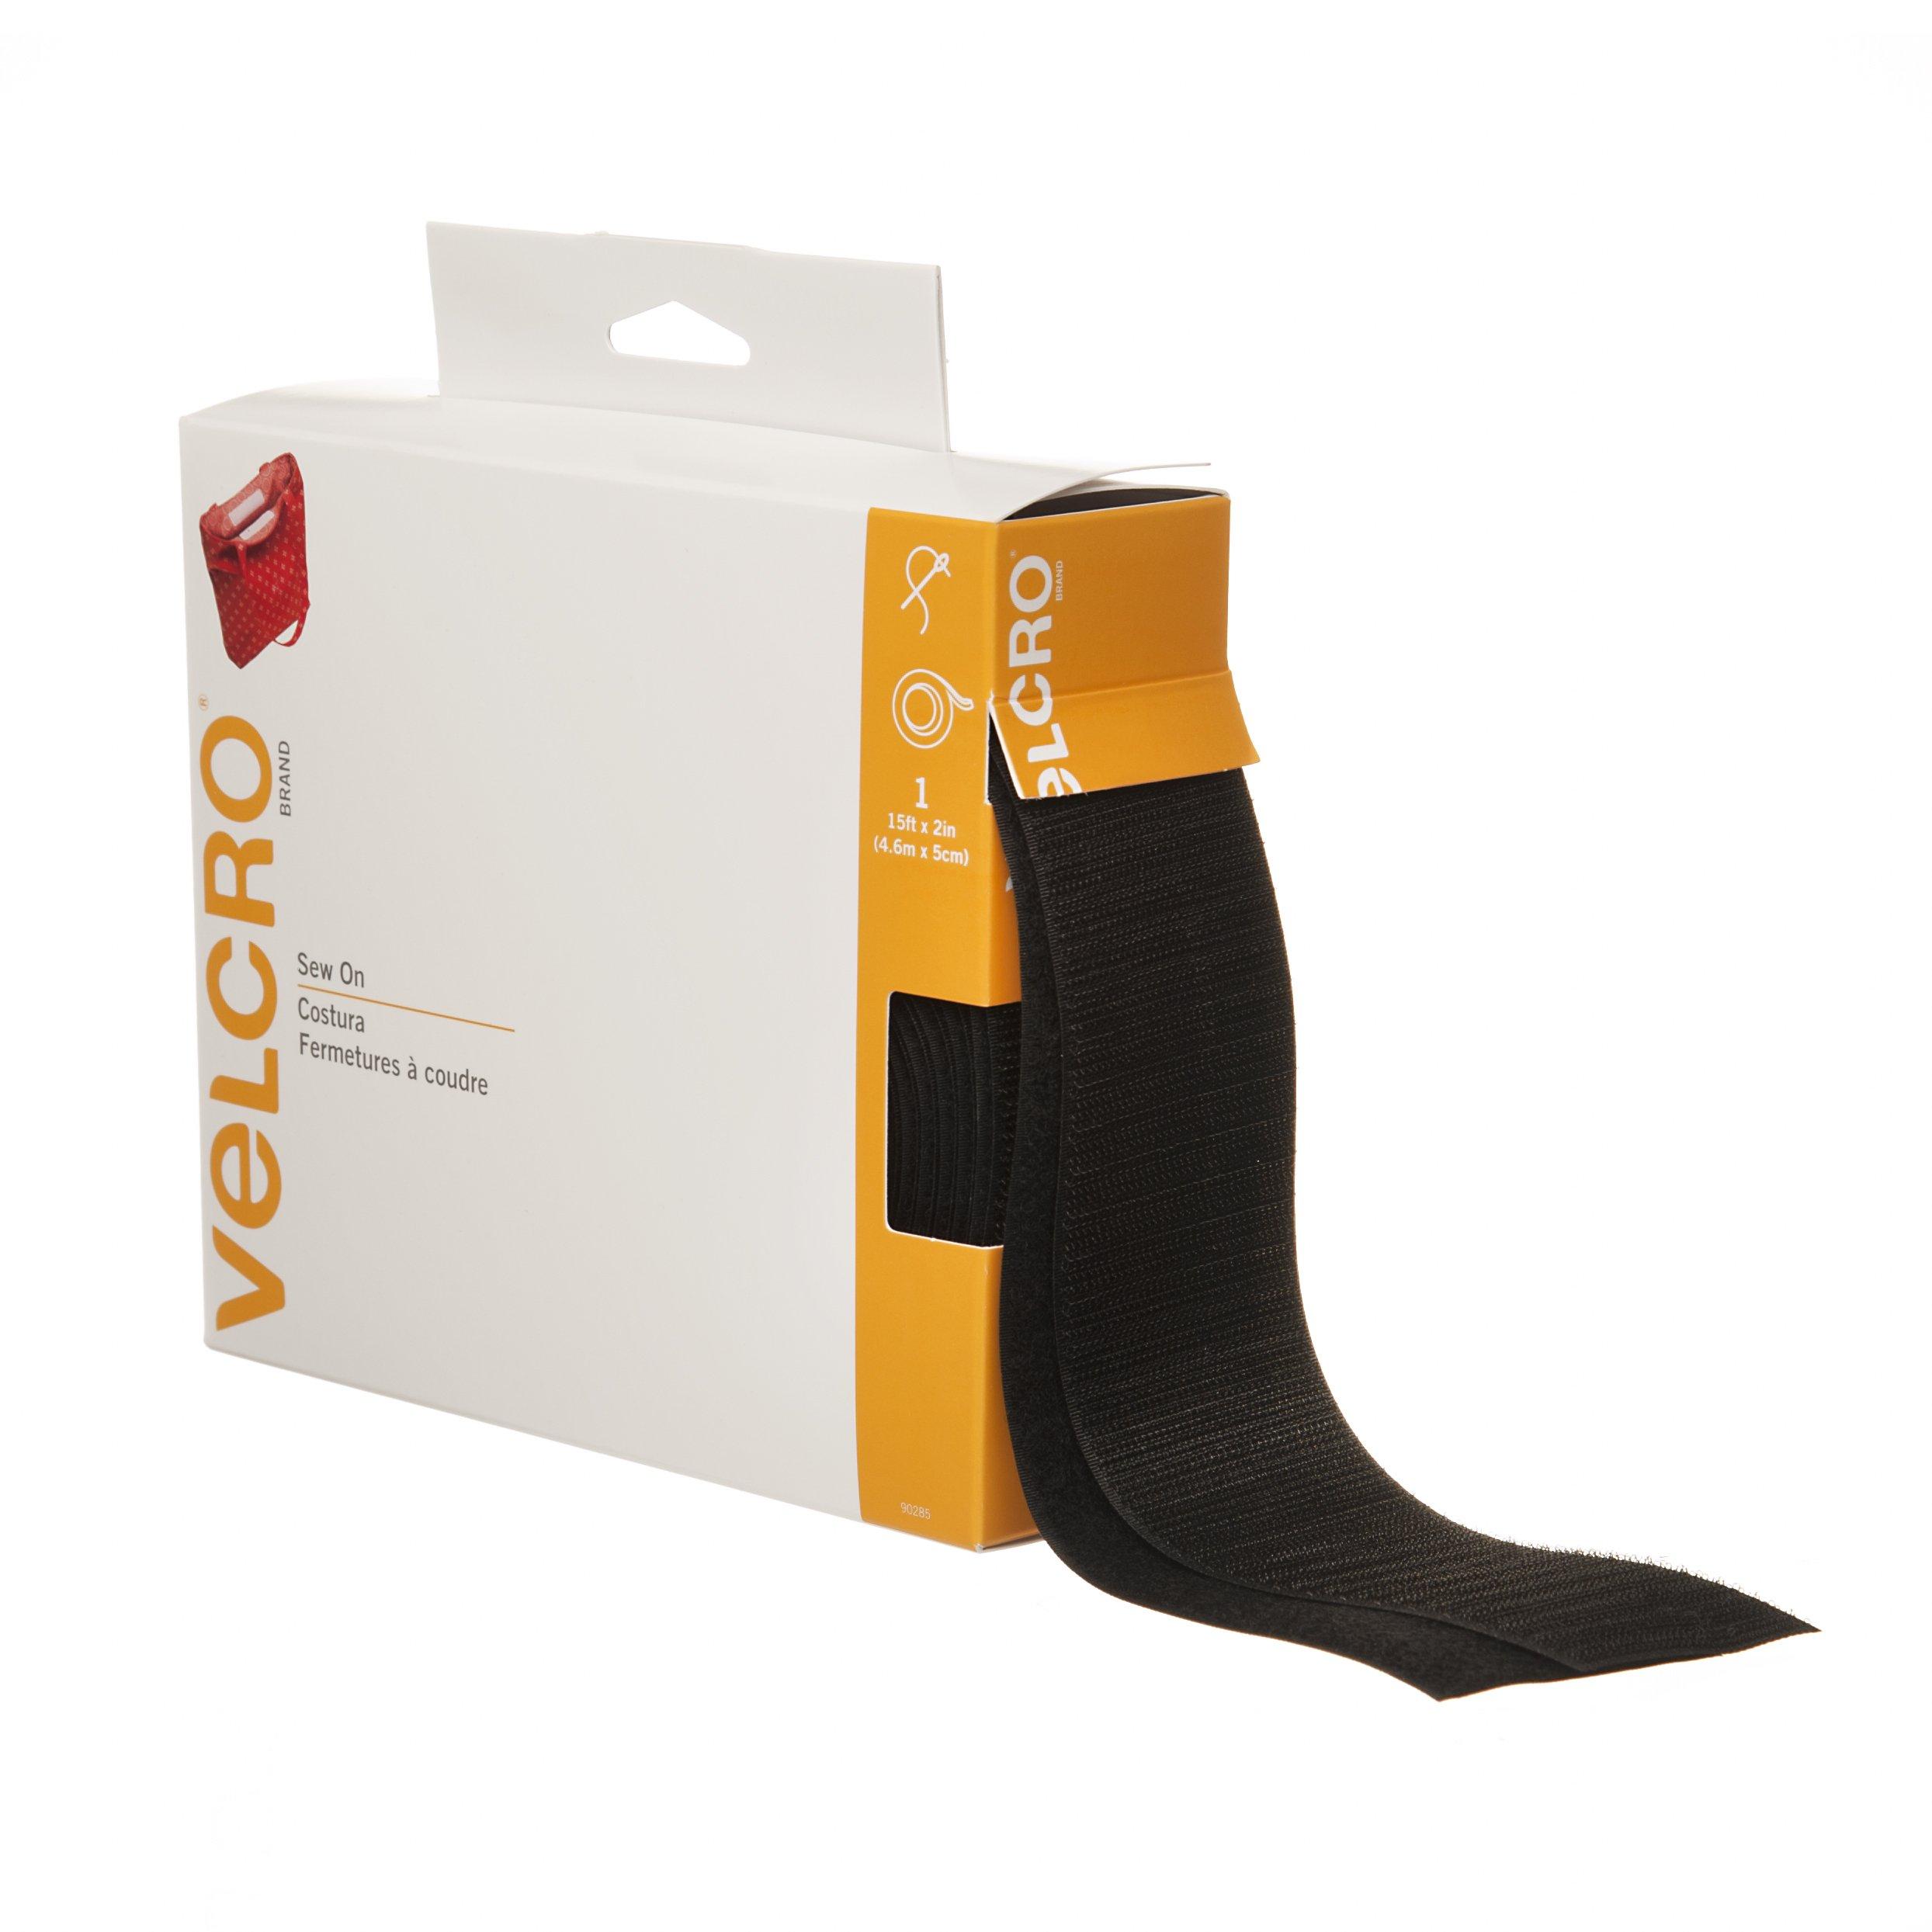 VELCRO Brand - Sew On Fasteners - 15' x 2'' Tape - Black